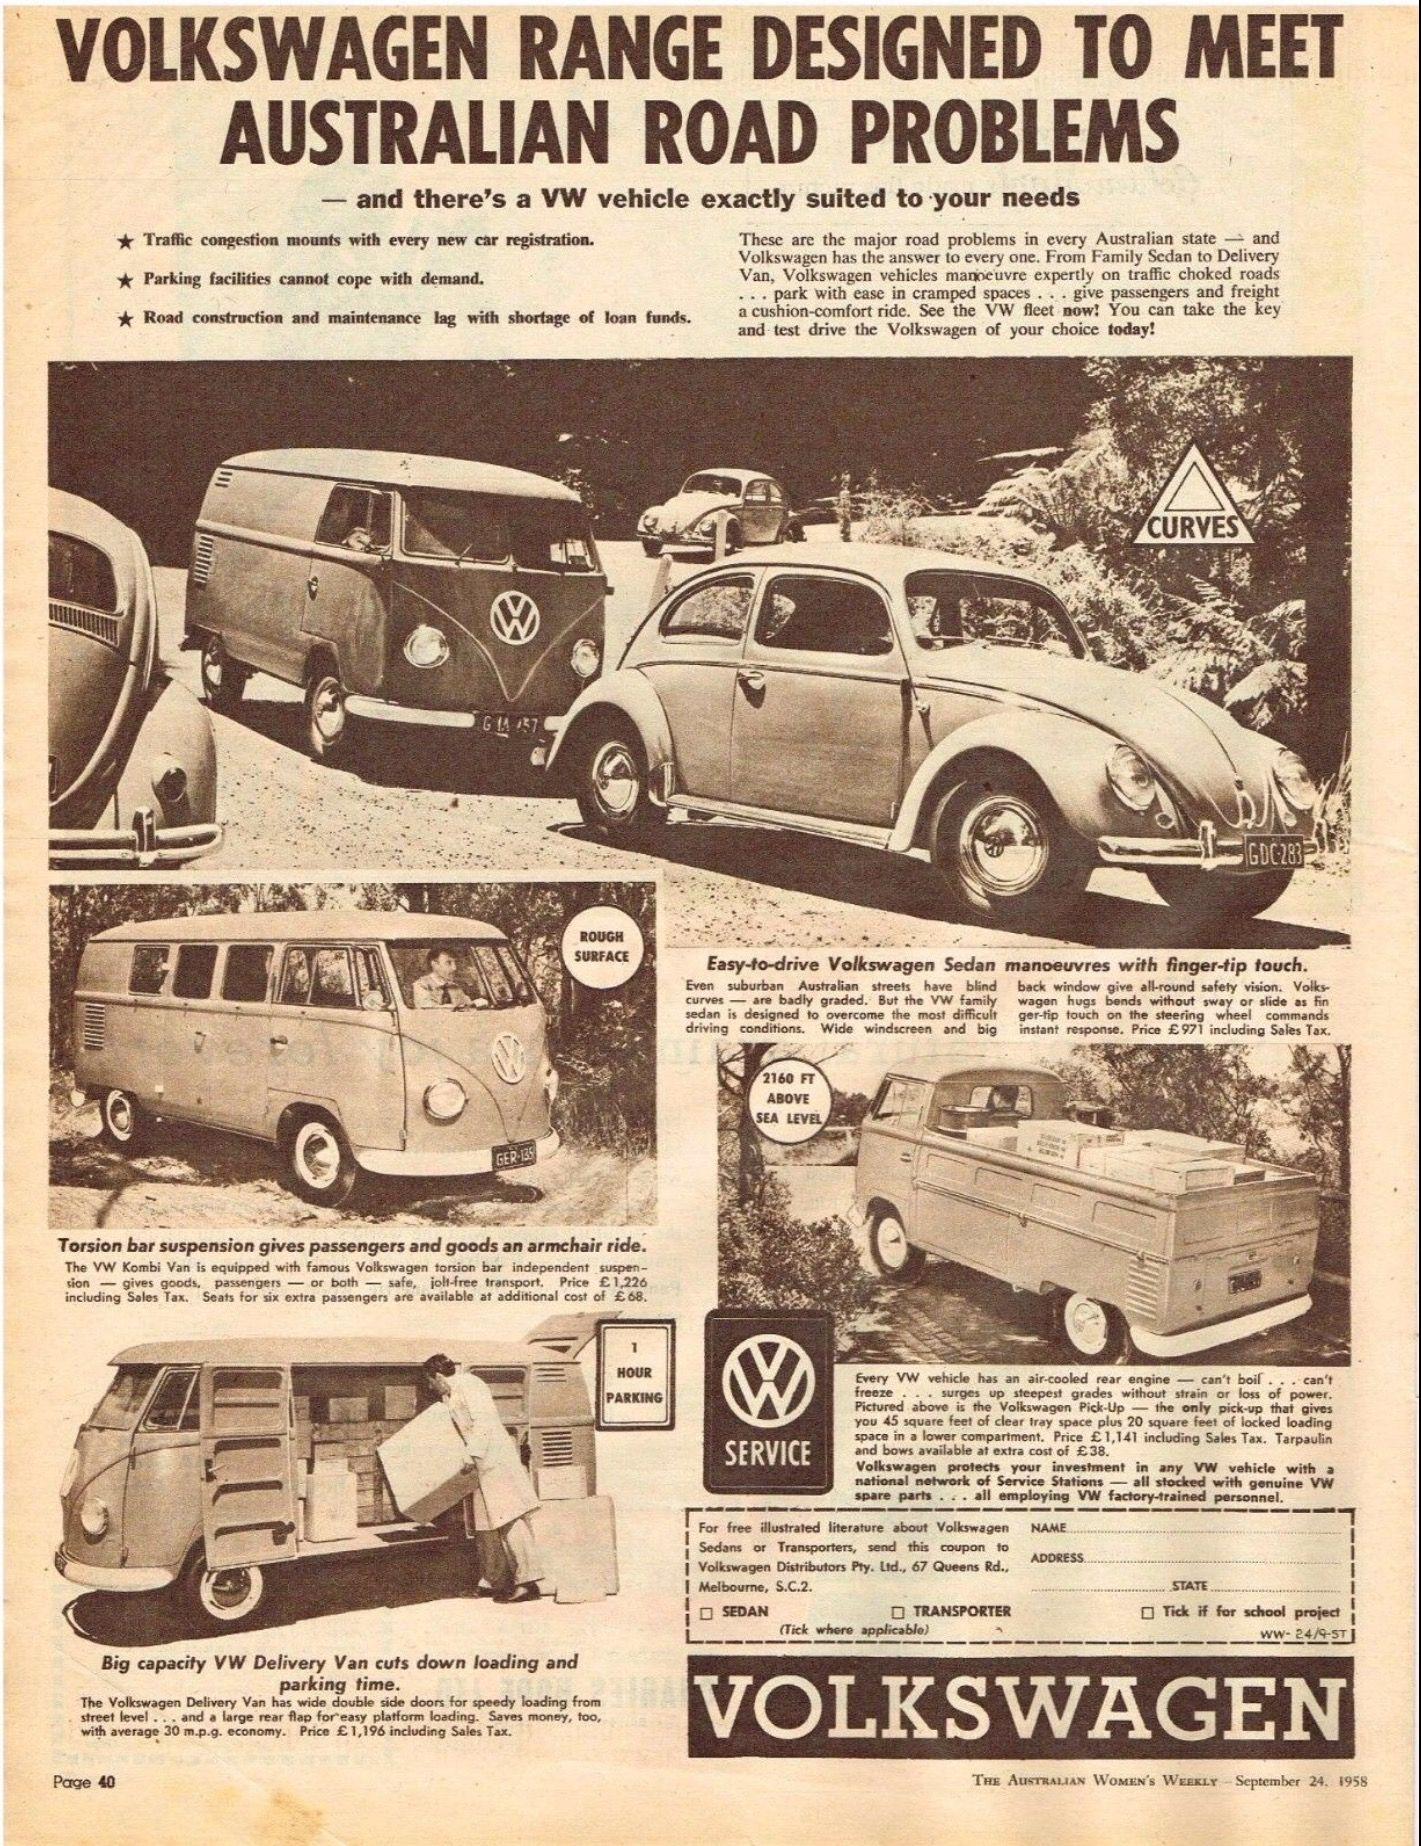 Pin by Asbjørn on VW ads   Pinterest   Vw, Volkswagen and Beetles